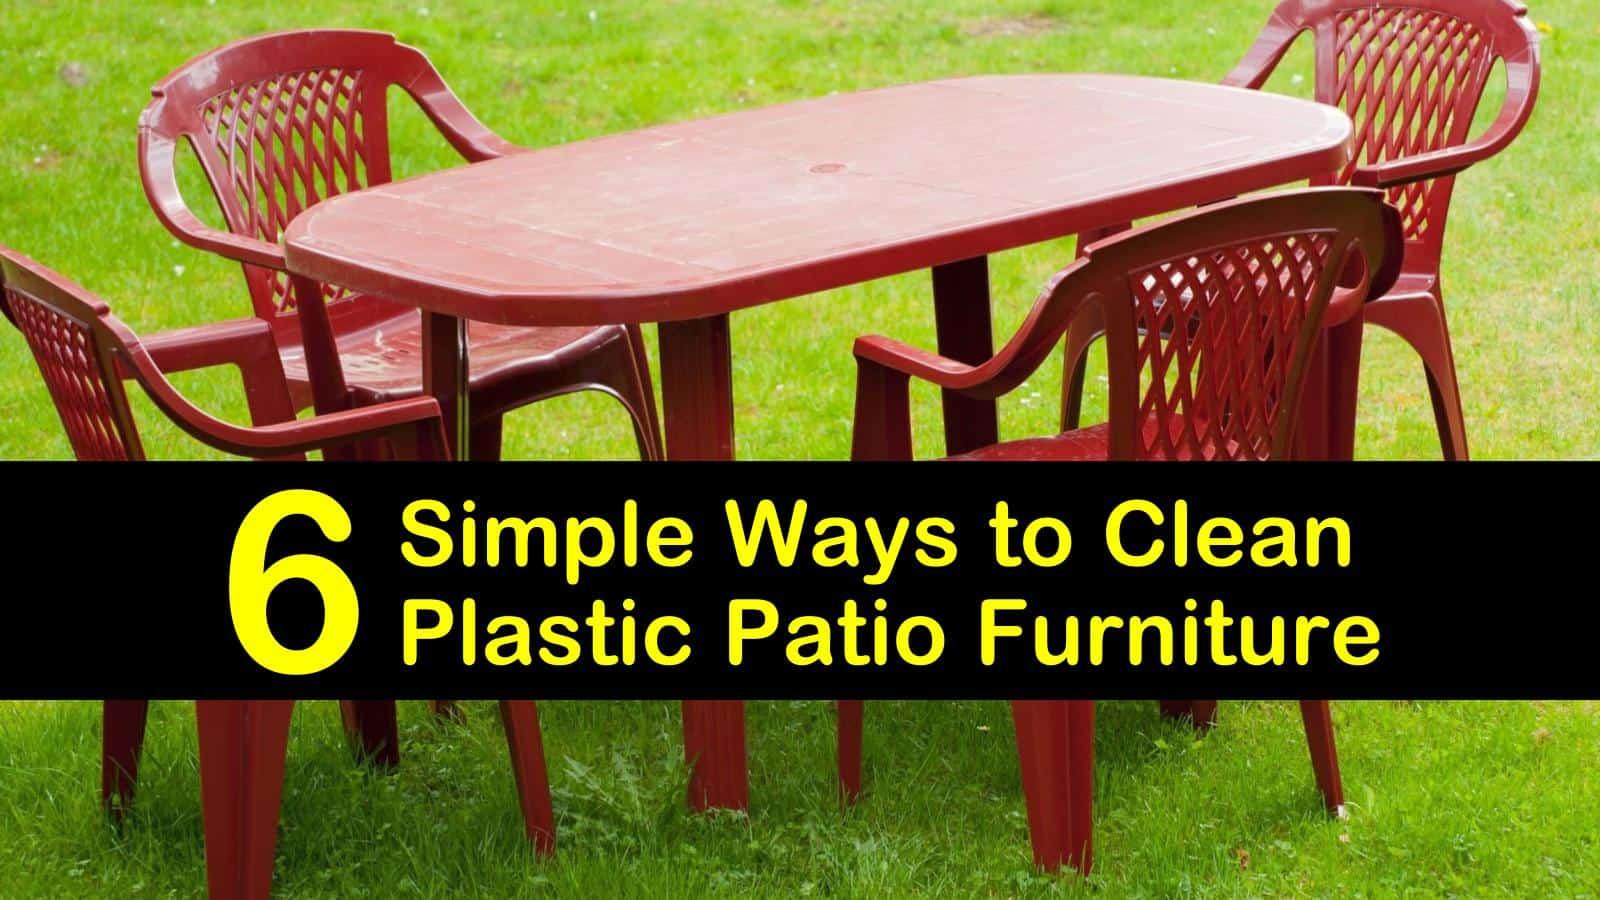 to clean plastic patio furniture